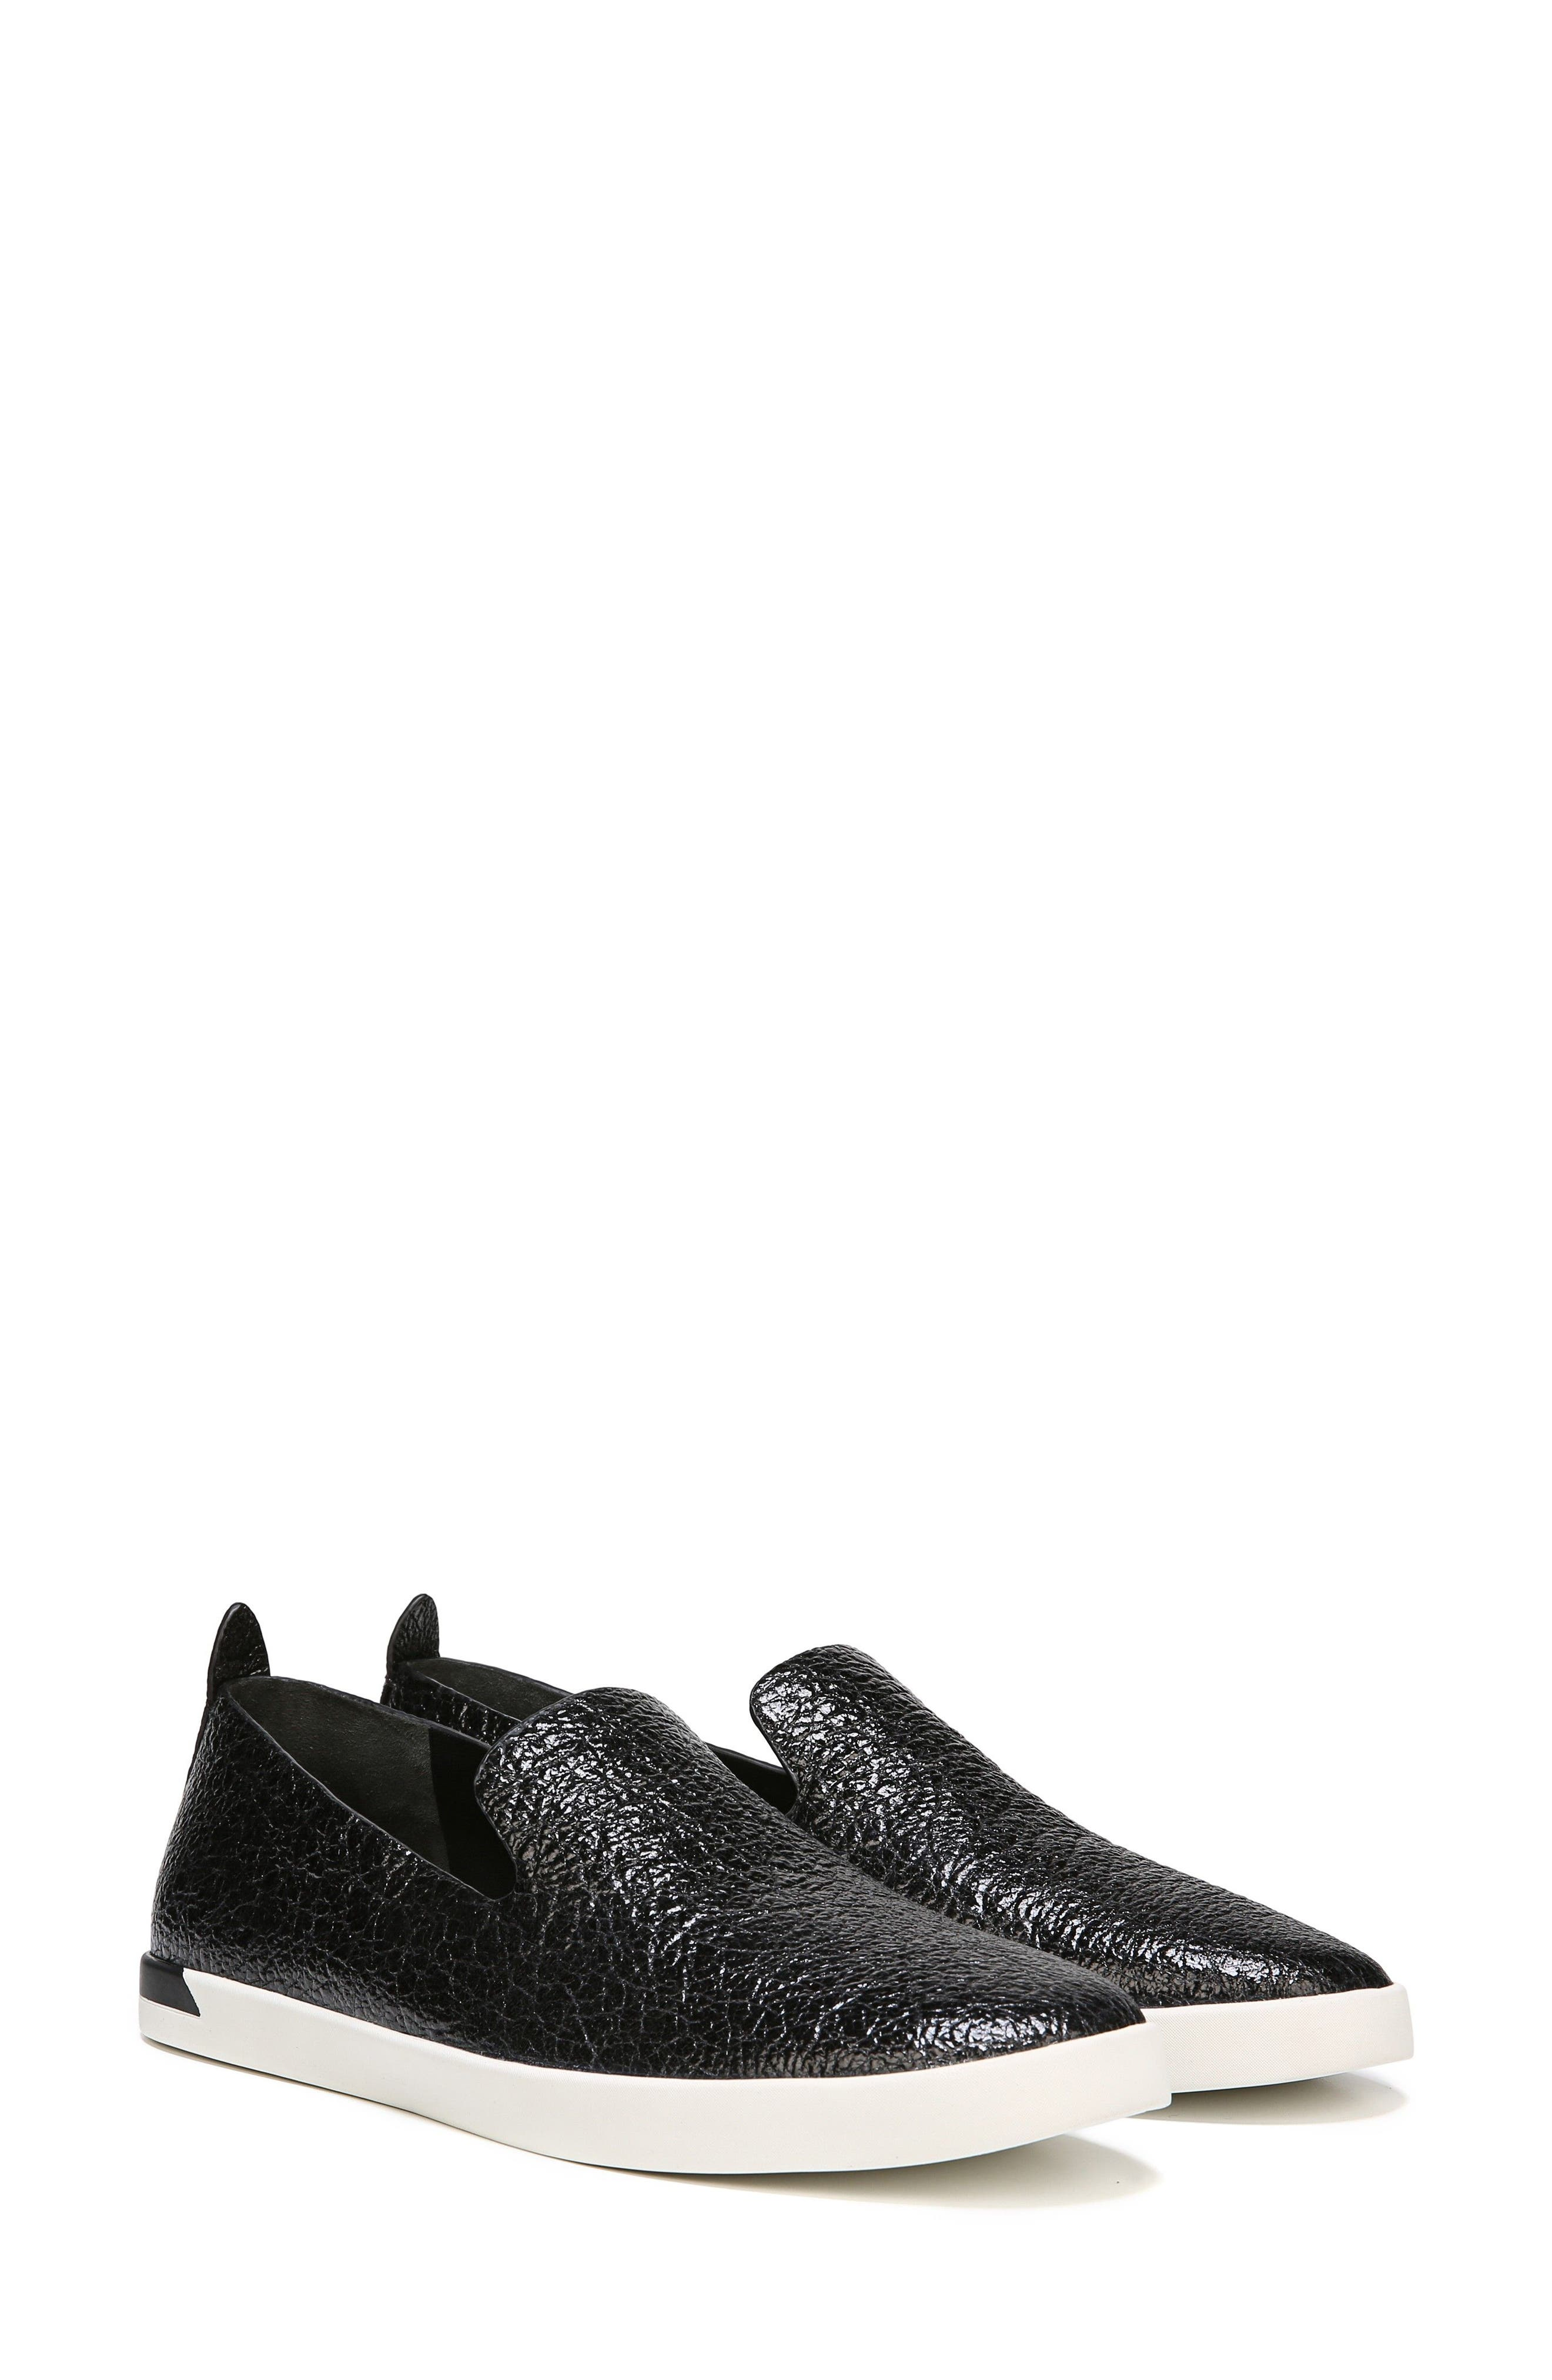 Vero Sneaker,                             Alternate thumbnail 6, color,                             003